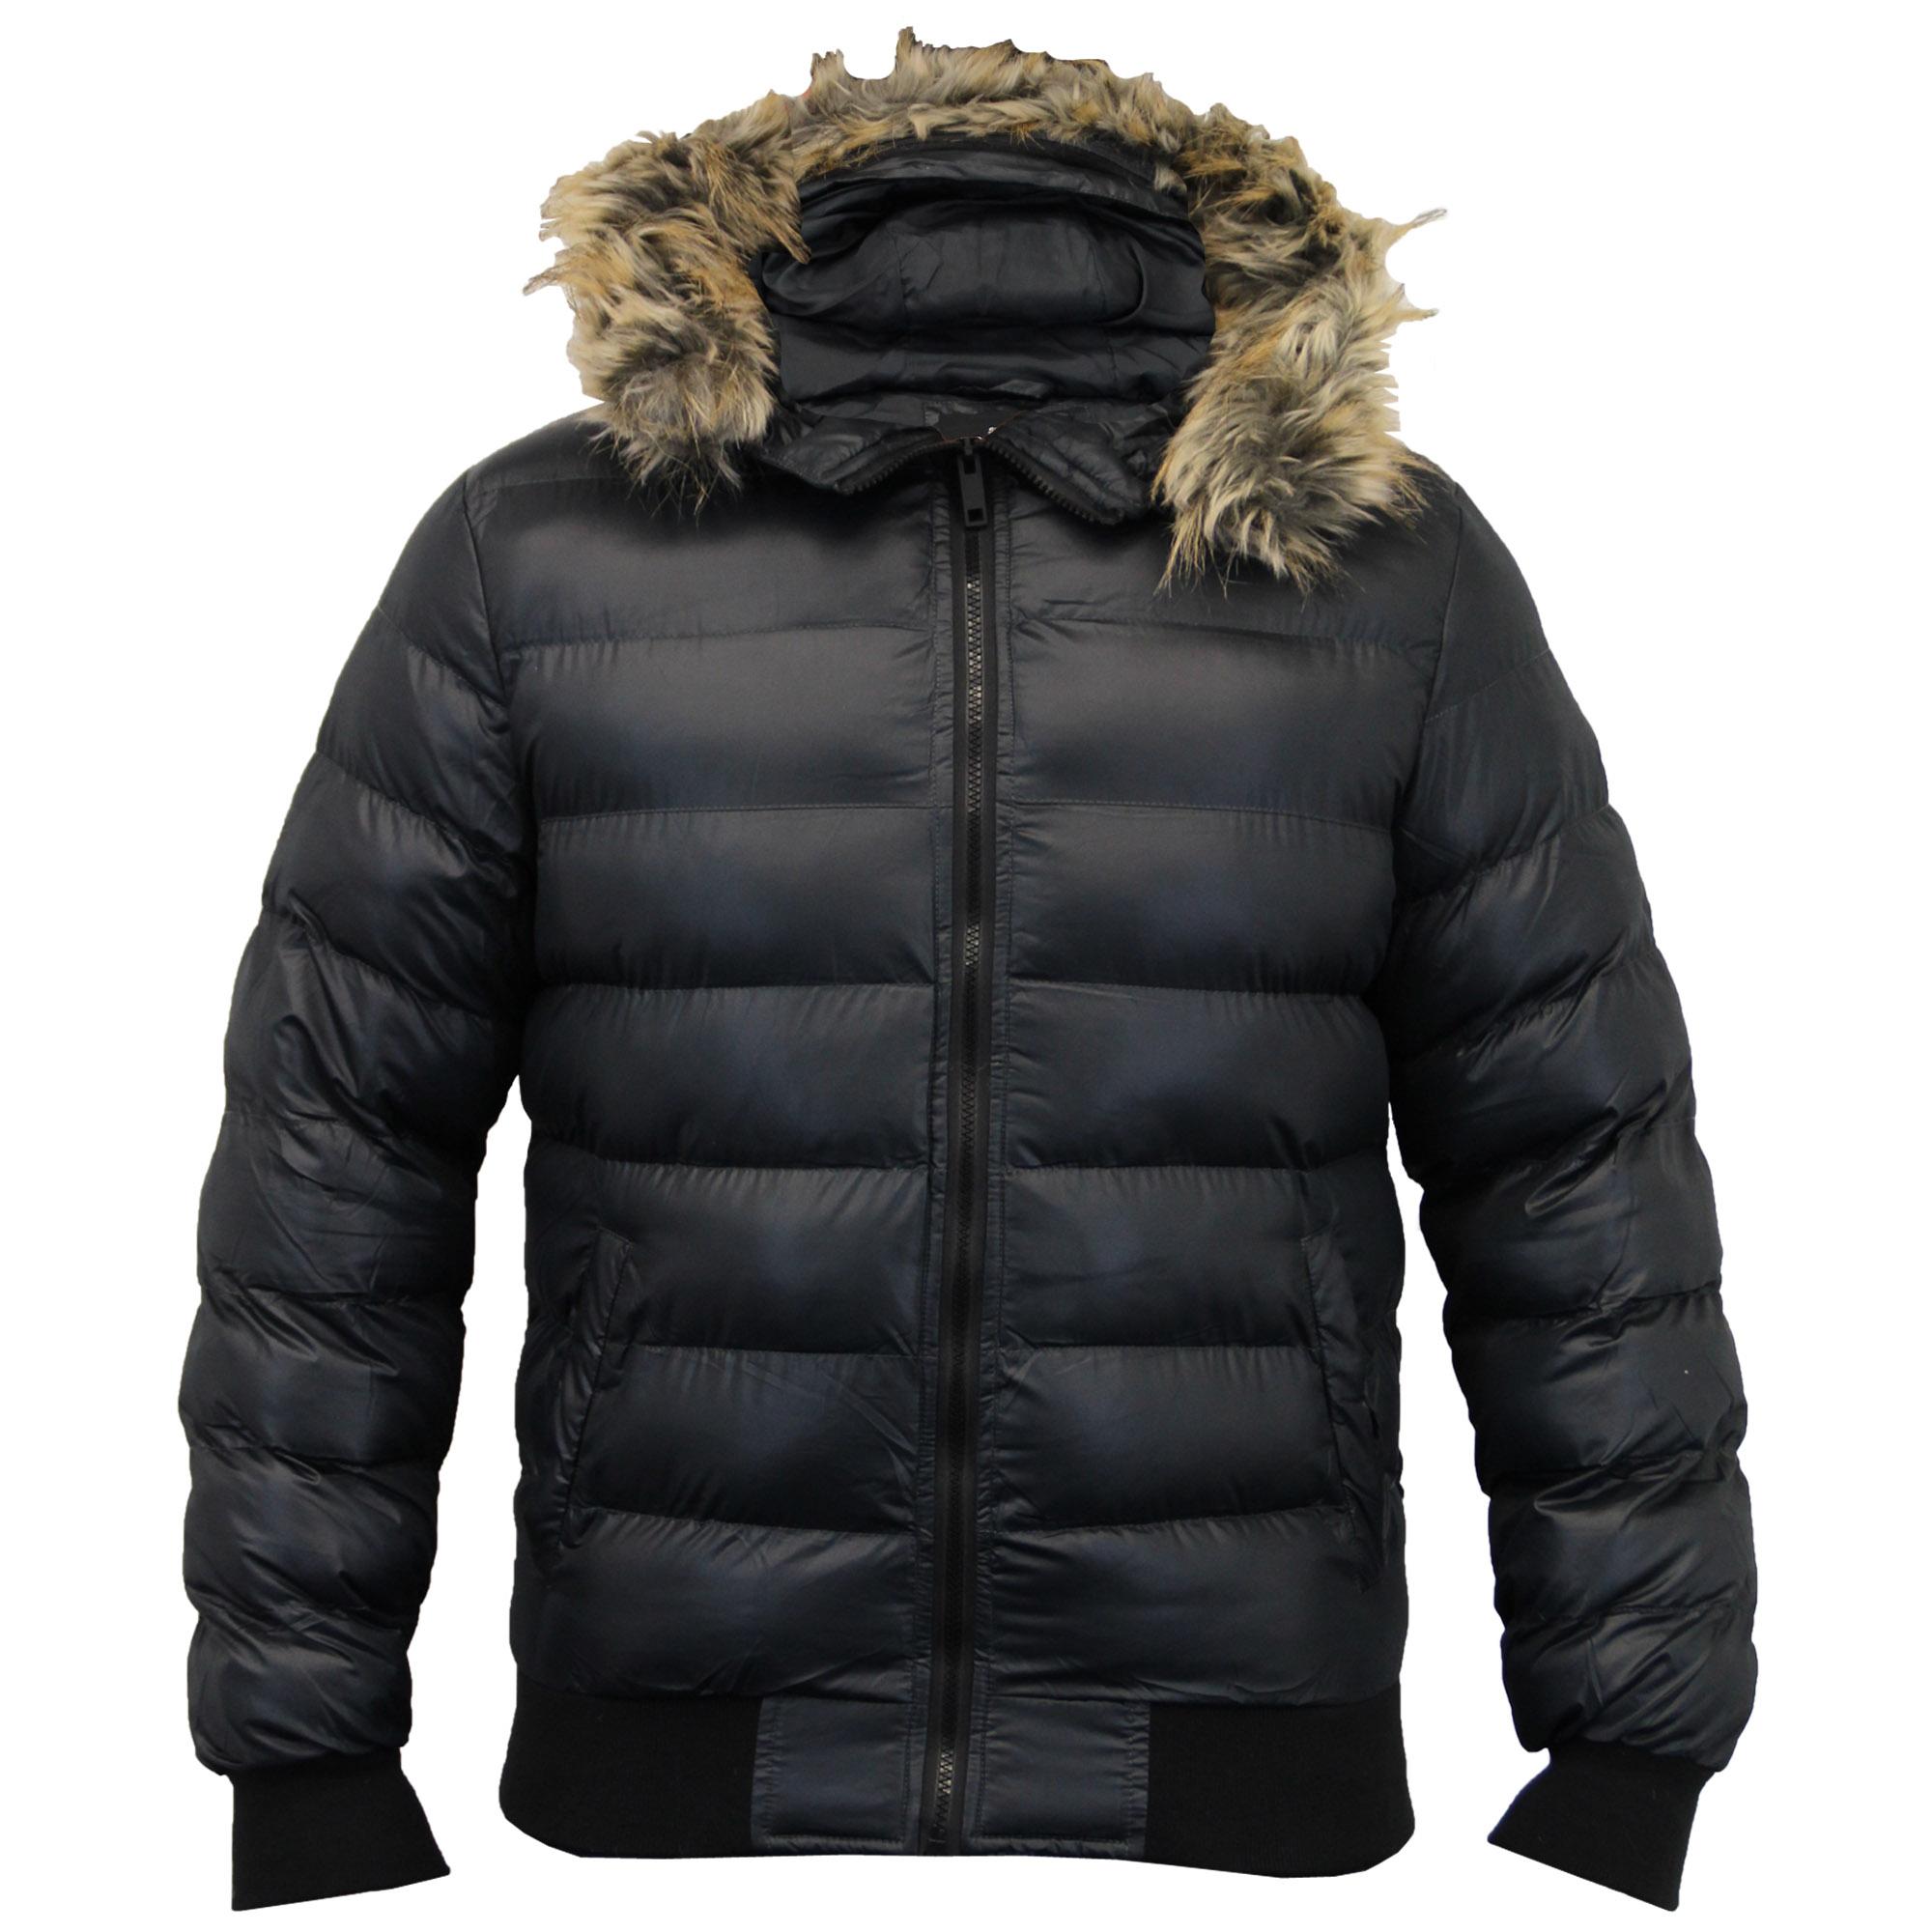 Buy mens parka jacket